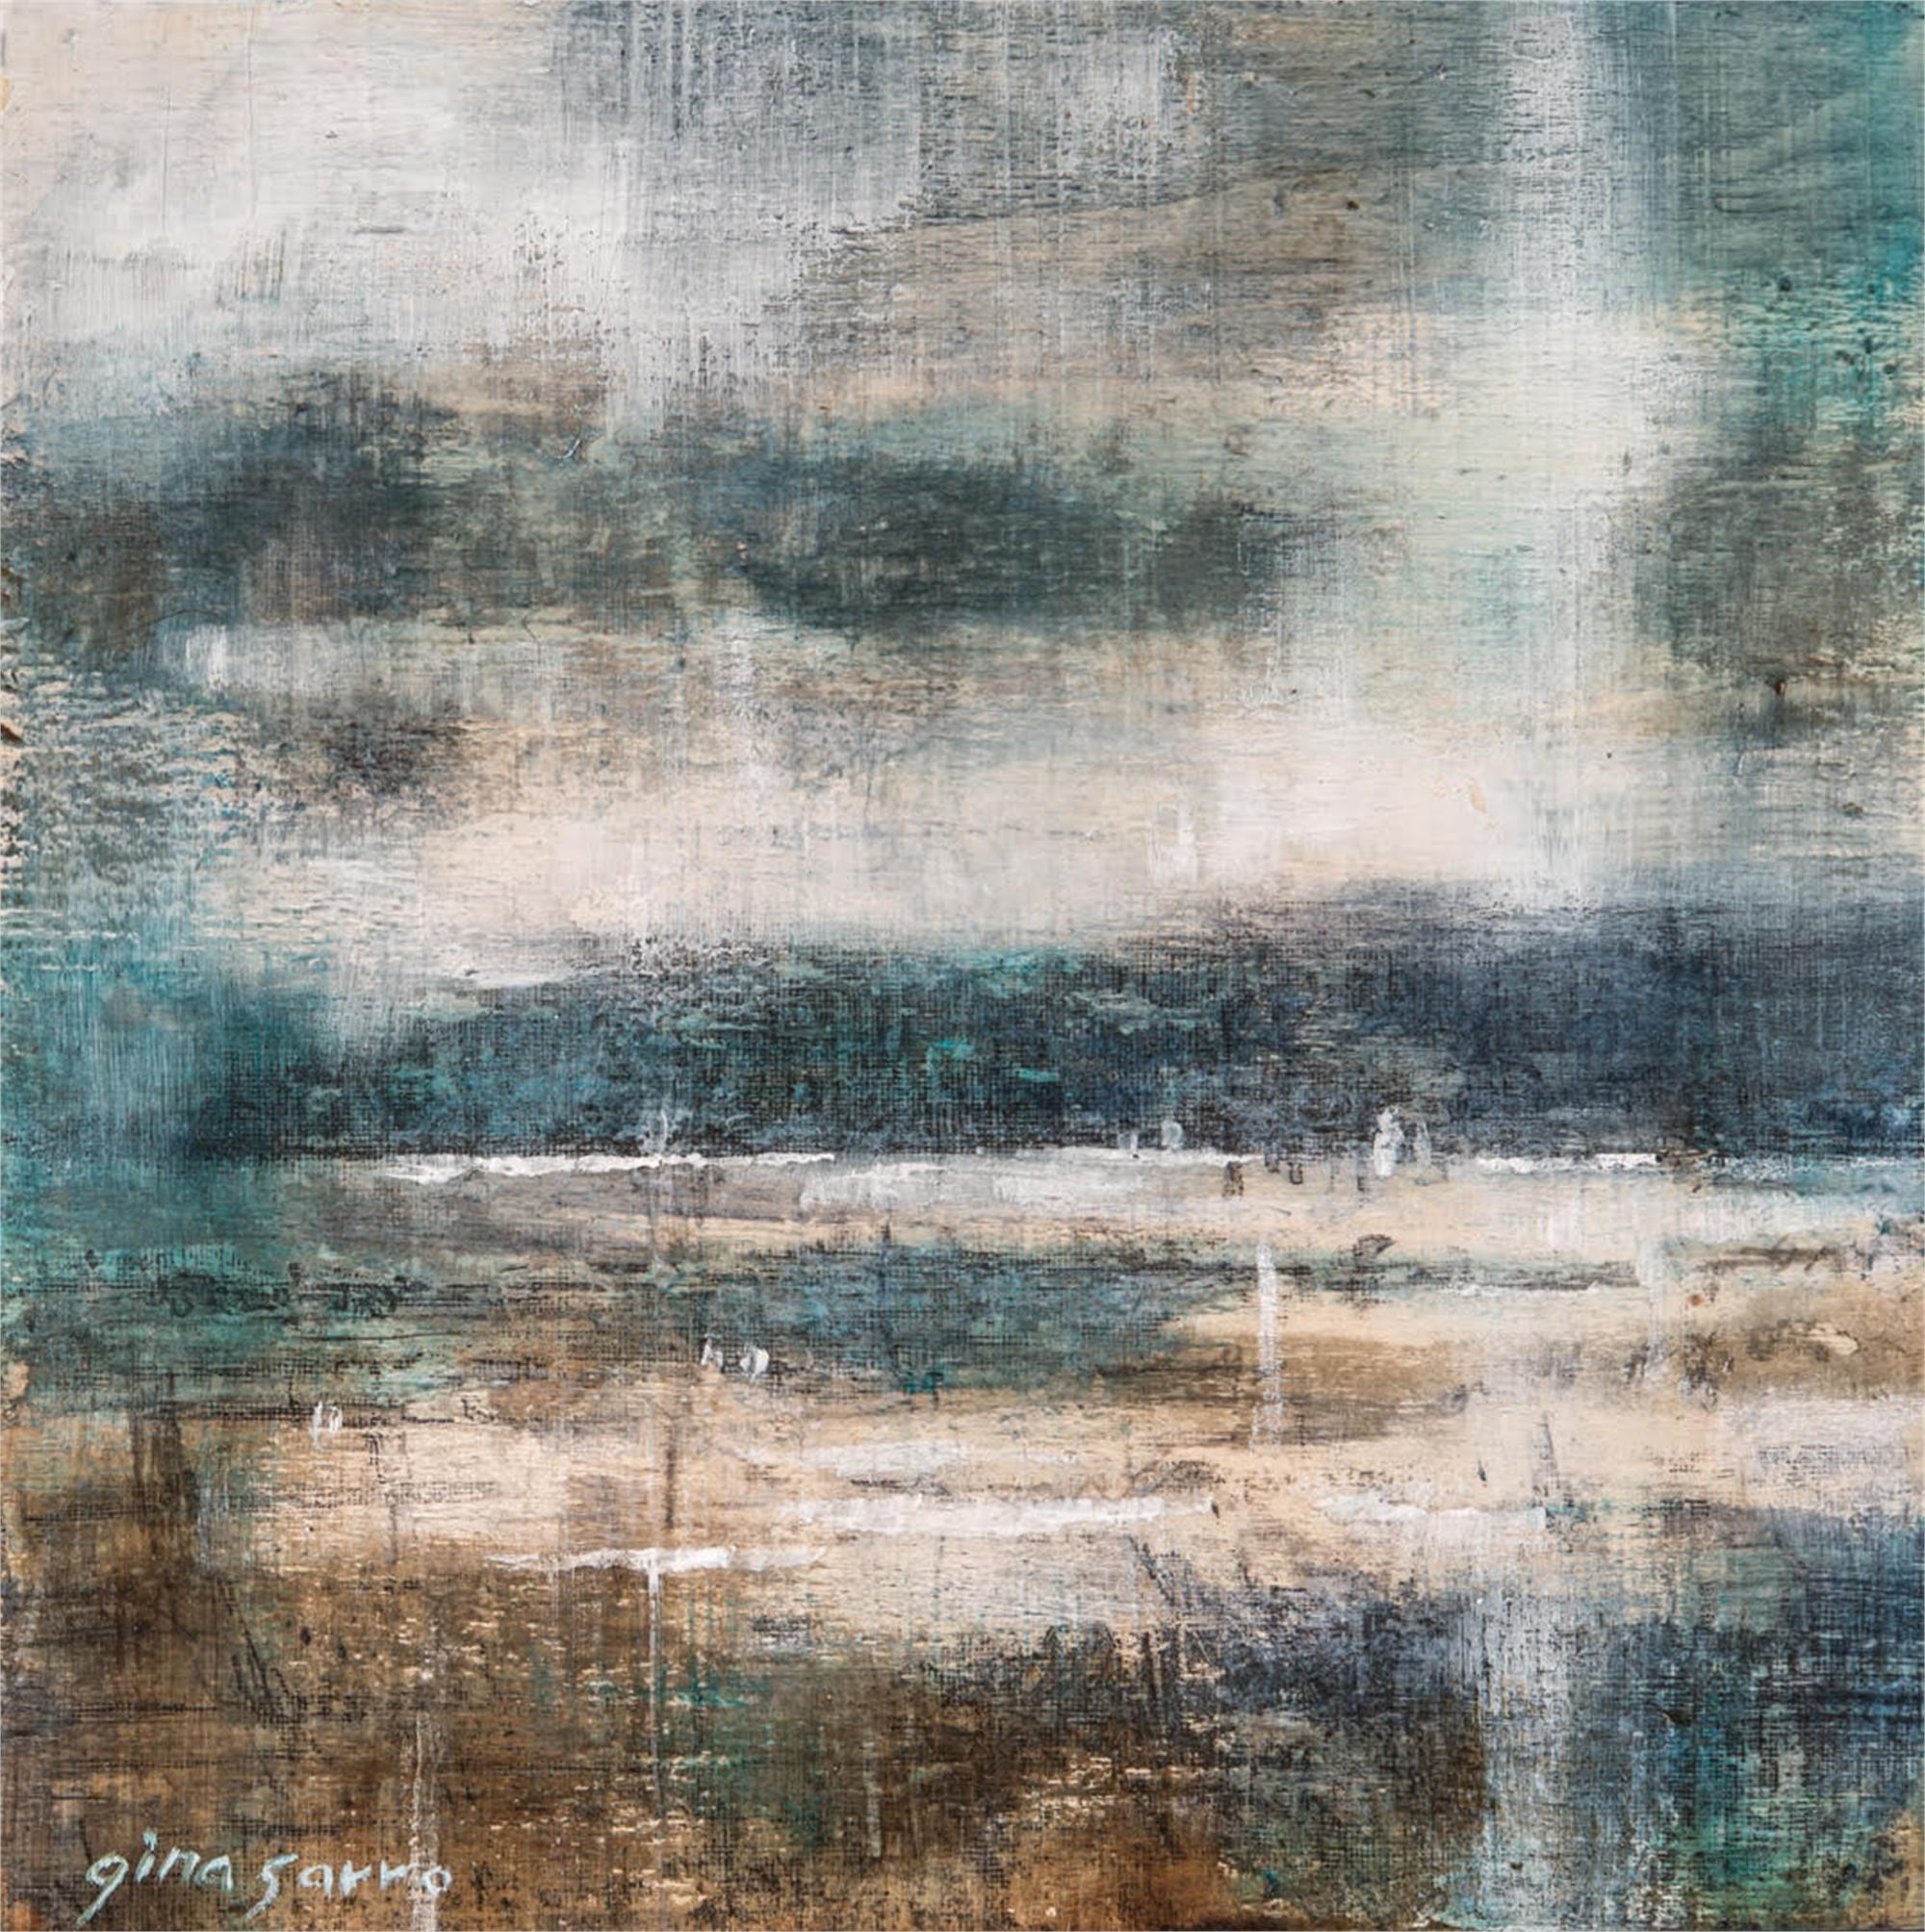 Vertical Horizons 8 by Gina Sarro